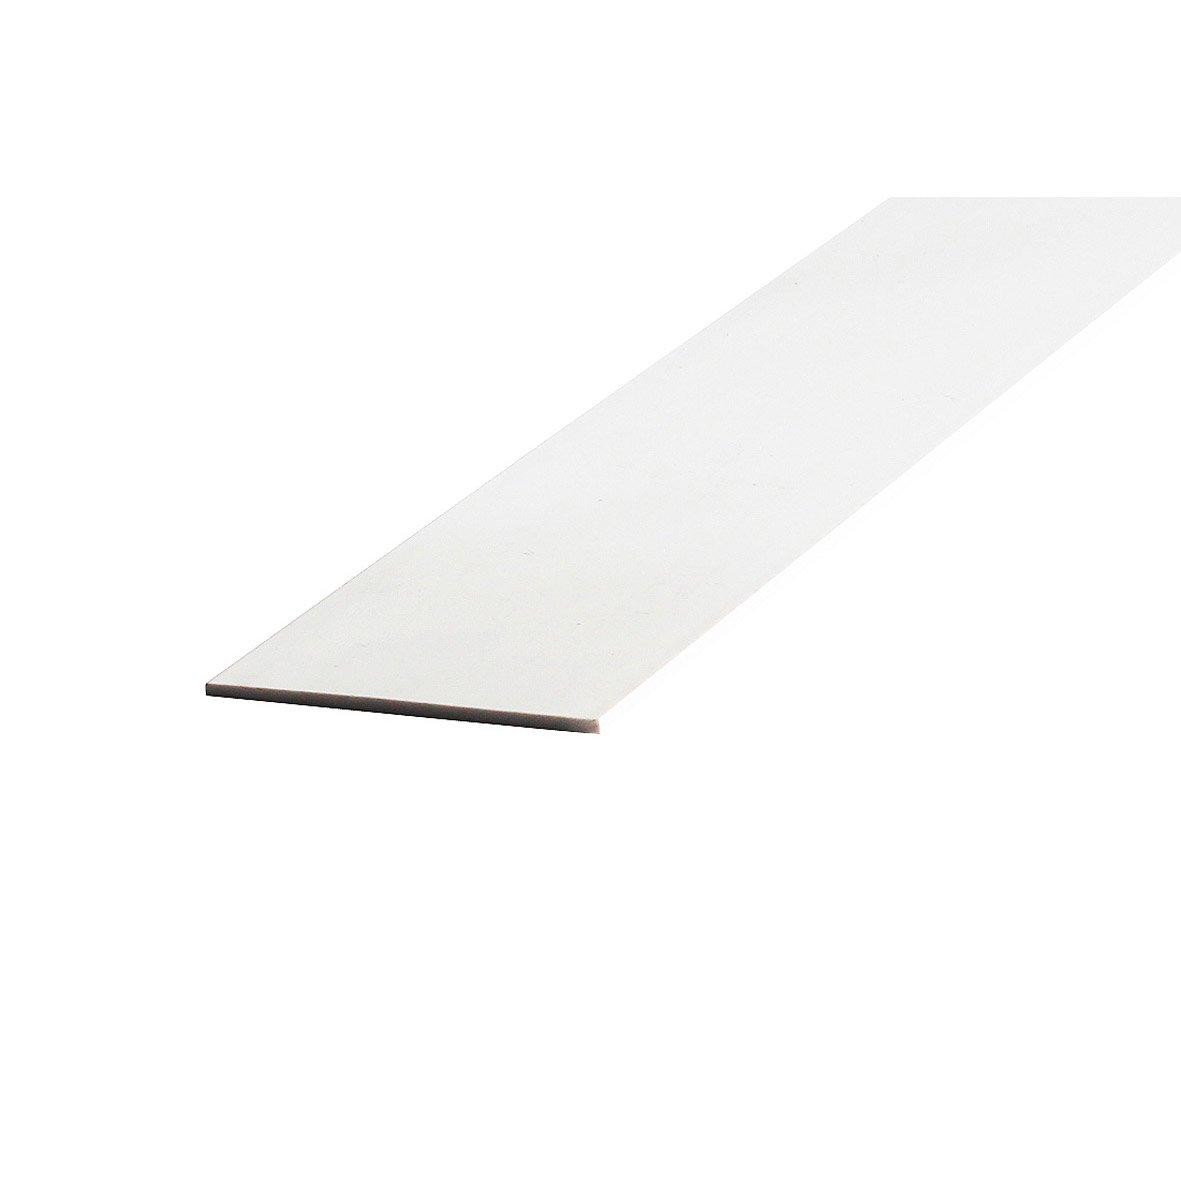 Champlat en pvc blanc 50 x 2 mm l 2 60 m leroy merlin for Ecksofa 2 50 m